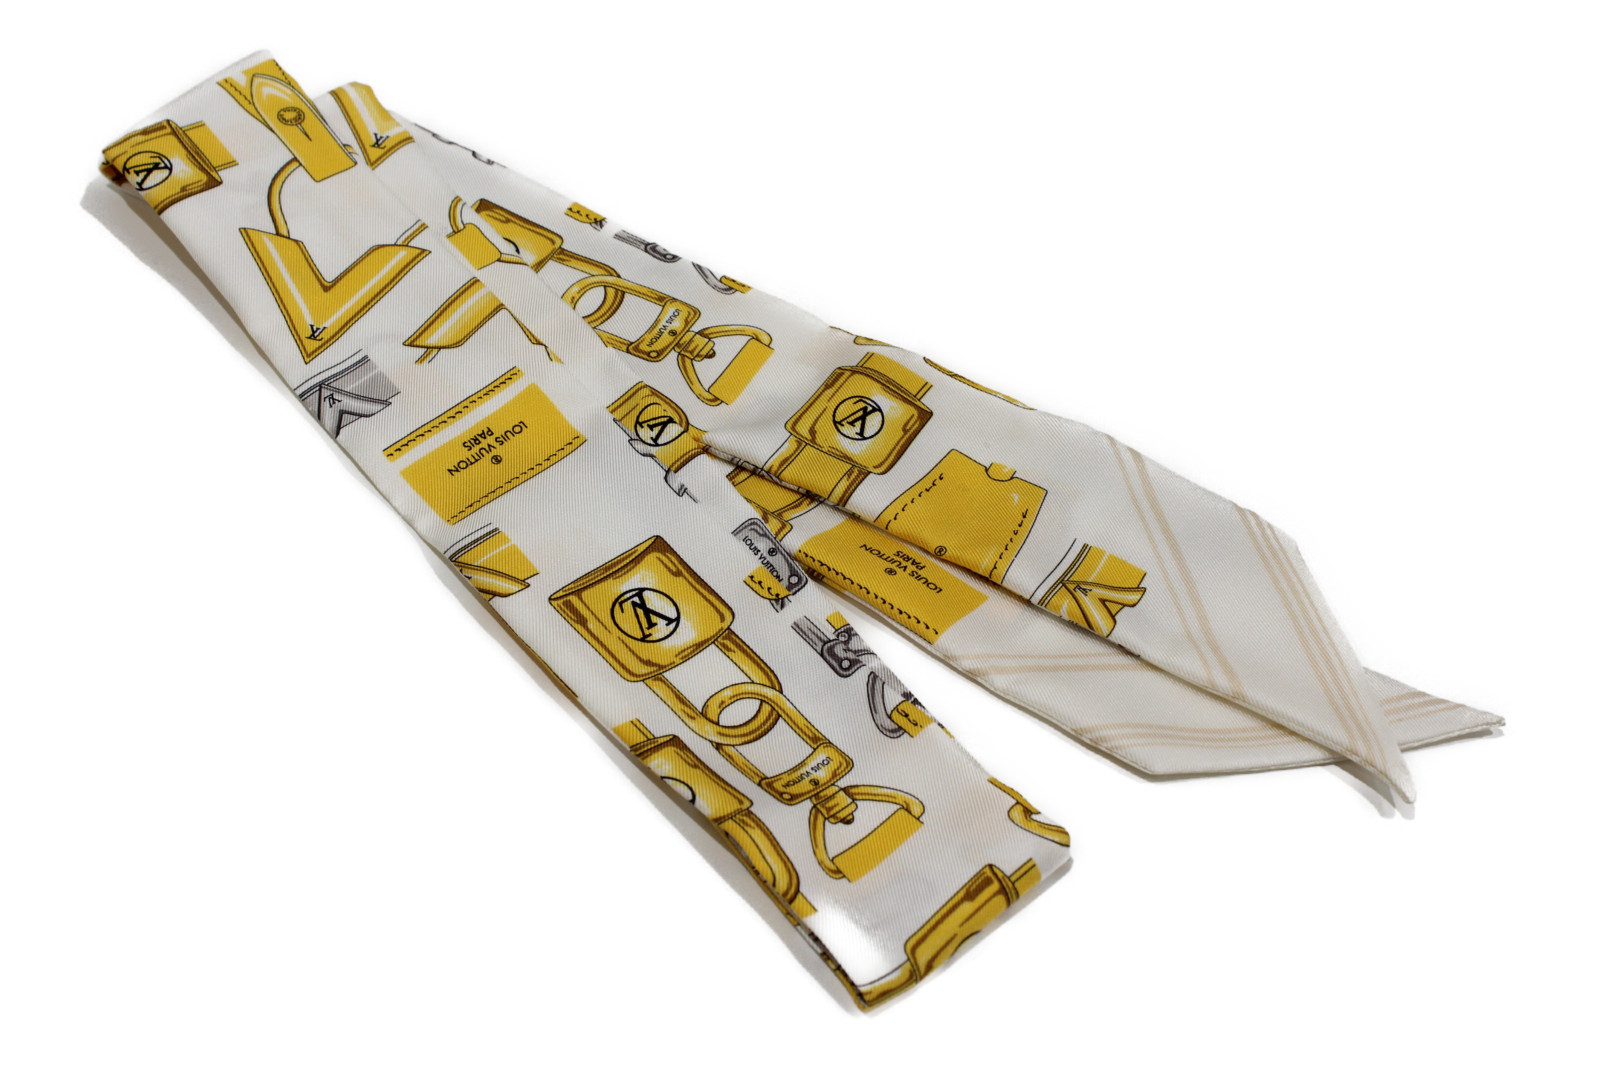 LOUIS VUITTON ルイヴィトン バンド-BBフルオブロックス M78652 スカーフ 鍵 黄色 白 スカーフバッグ レディース【中古】